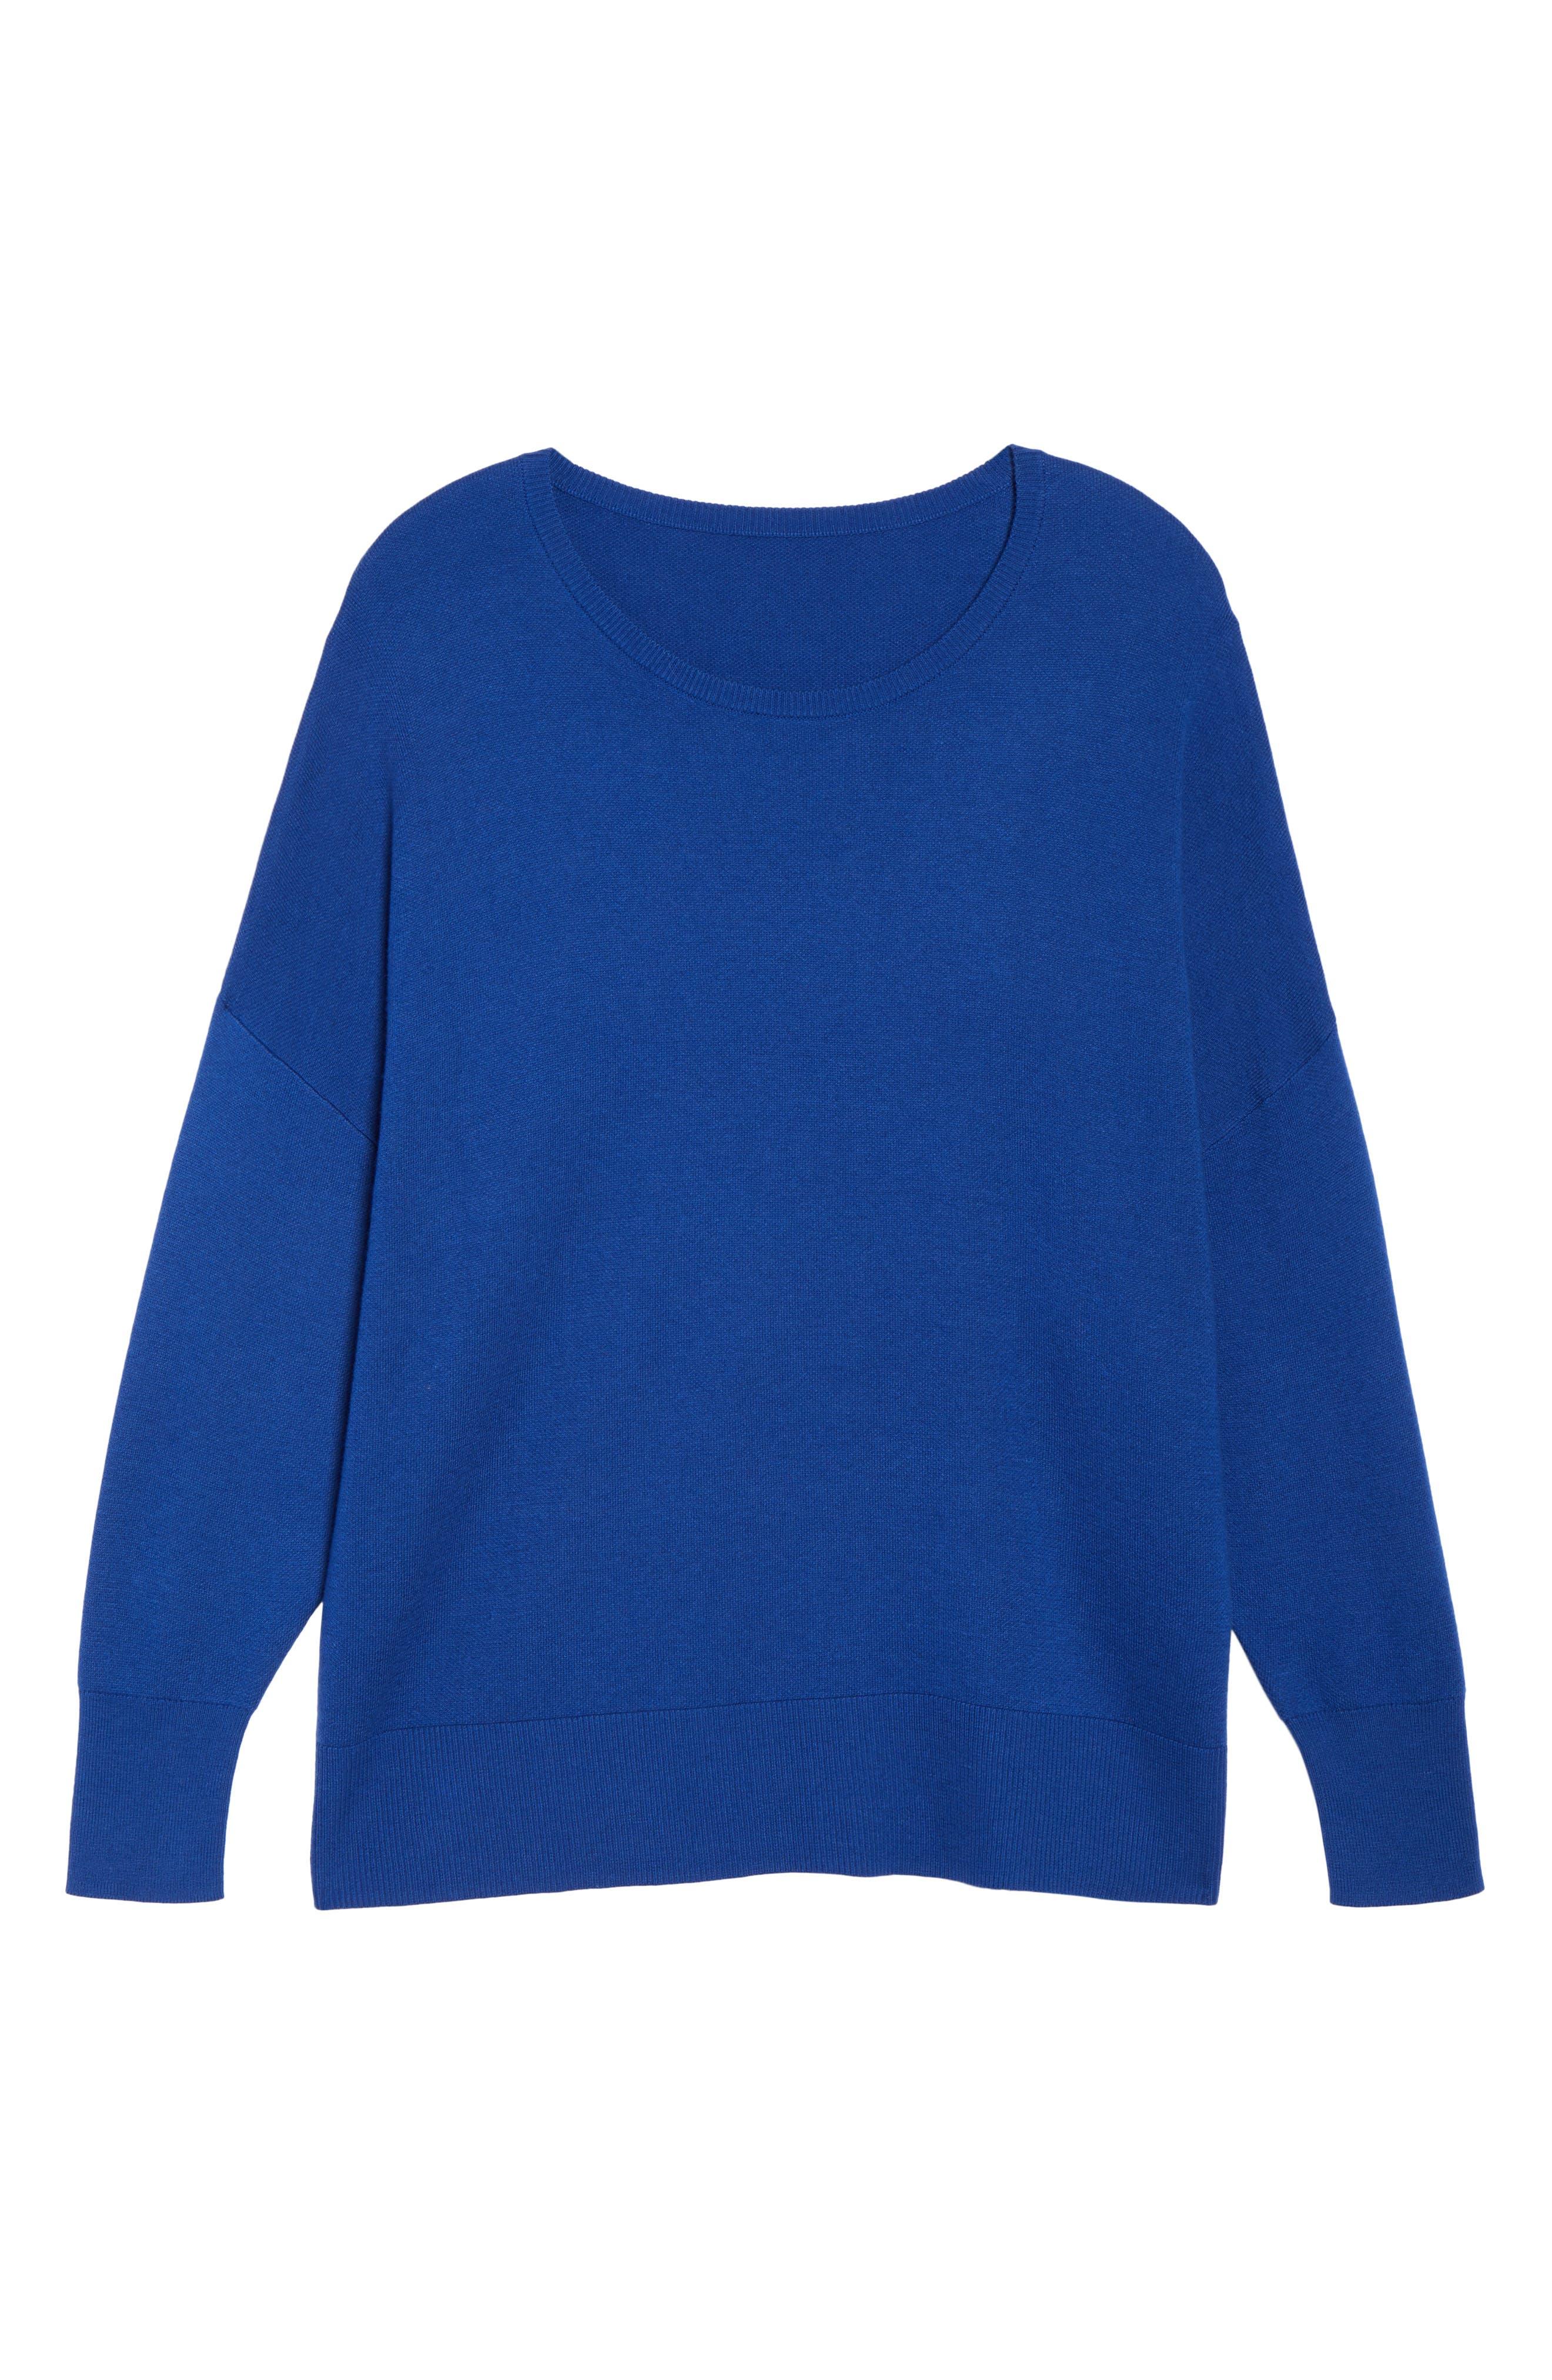 Dolman Sleeve Crewneck Sweater,                             Alternate thumbnail 29, color,